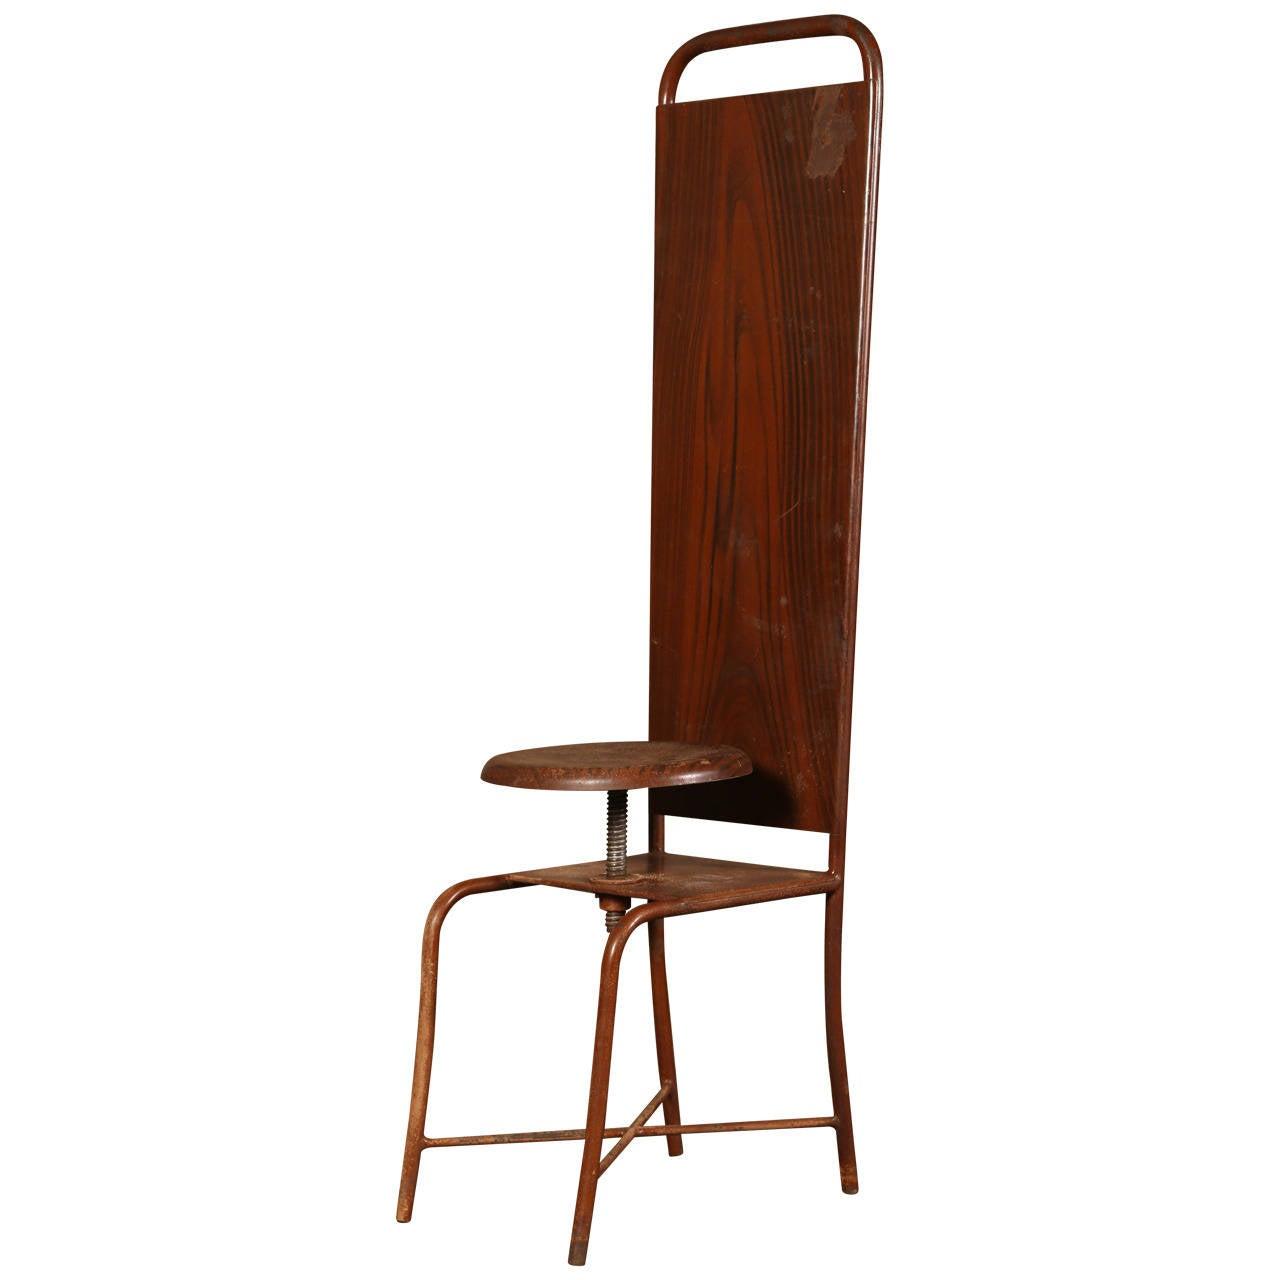 Original, Vintage Adjustable Medical Stool or Chair 1